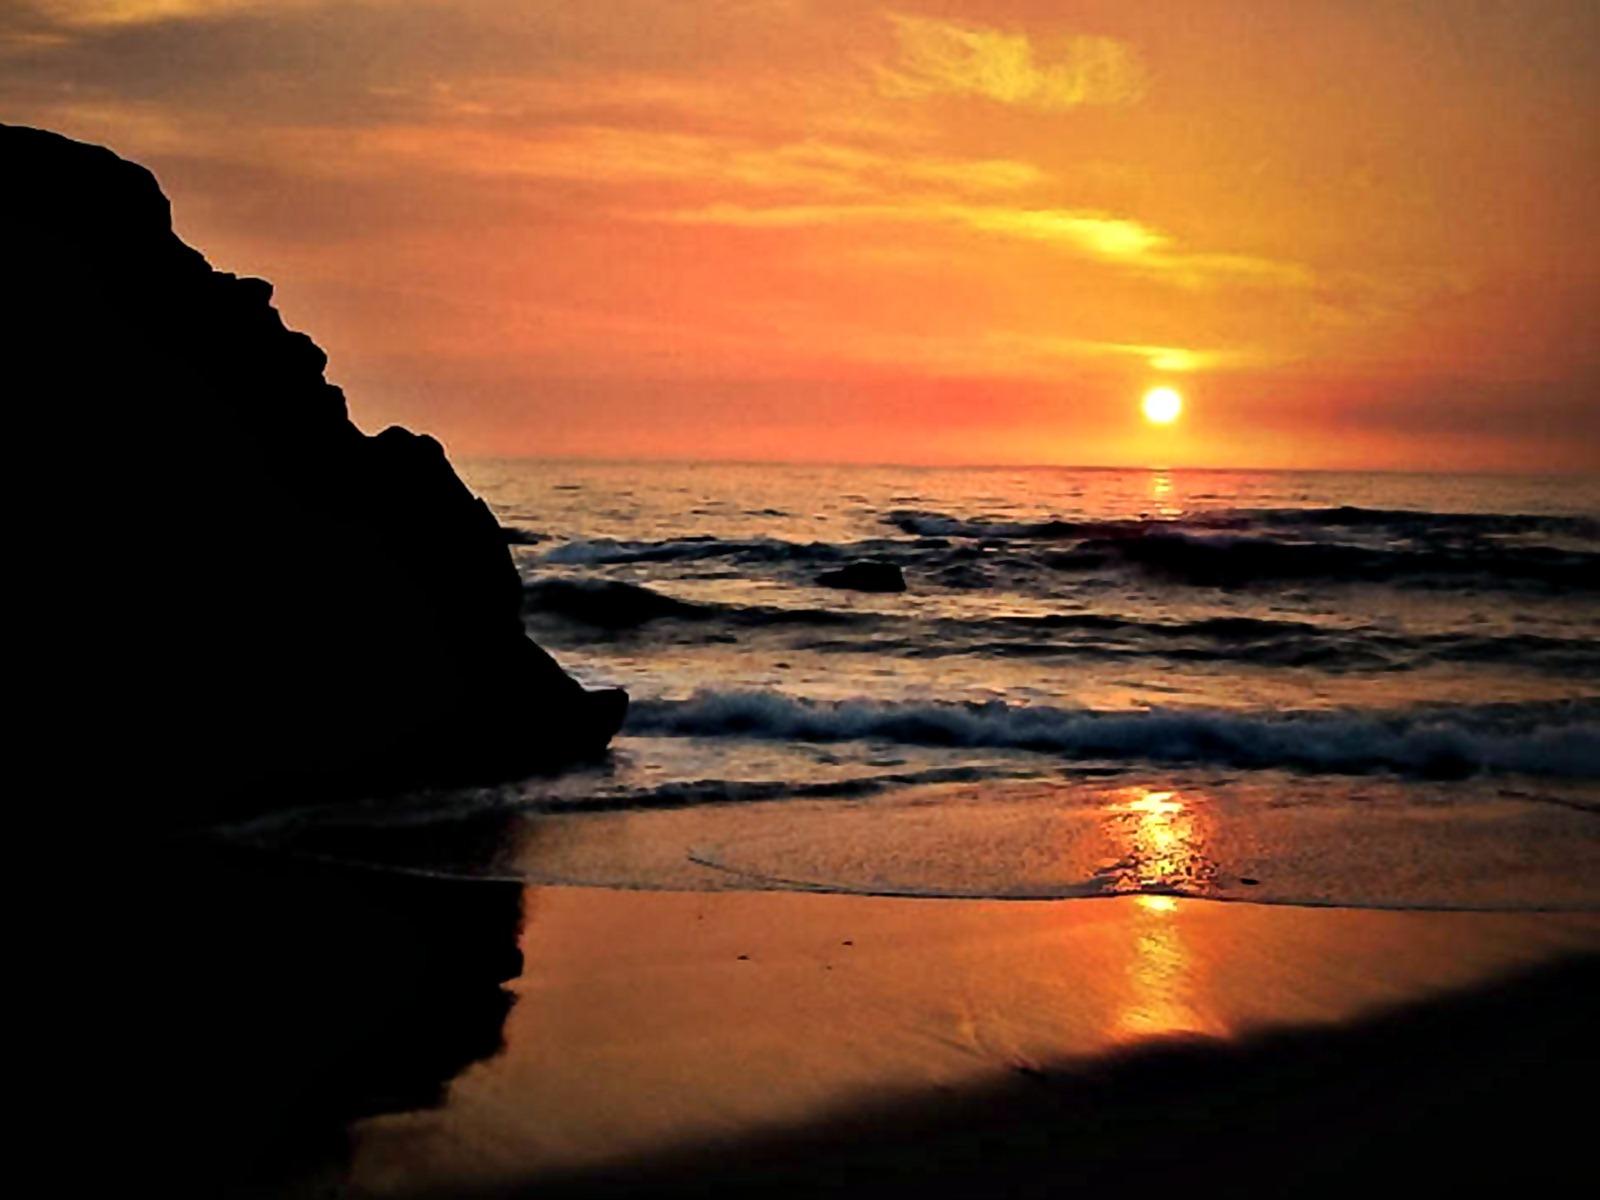 sunset wallpaper laguna beach california